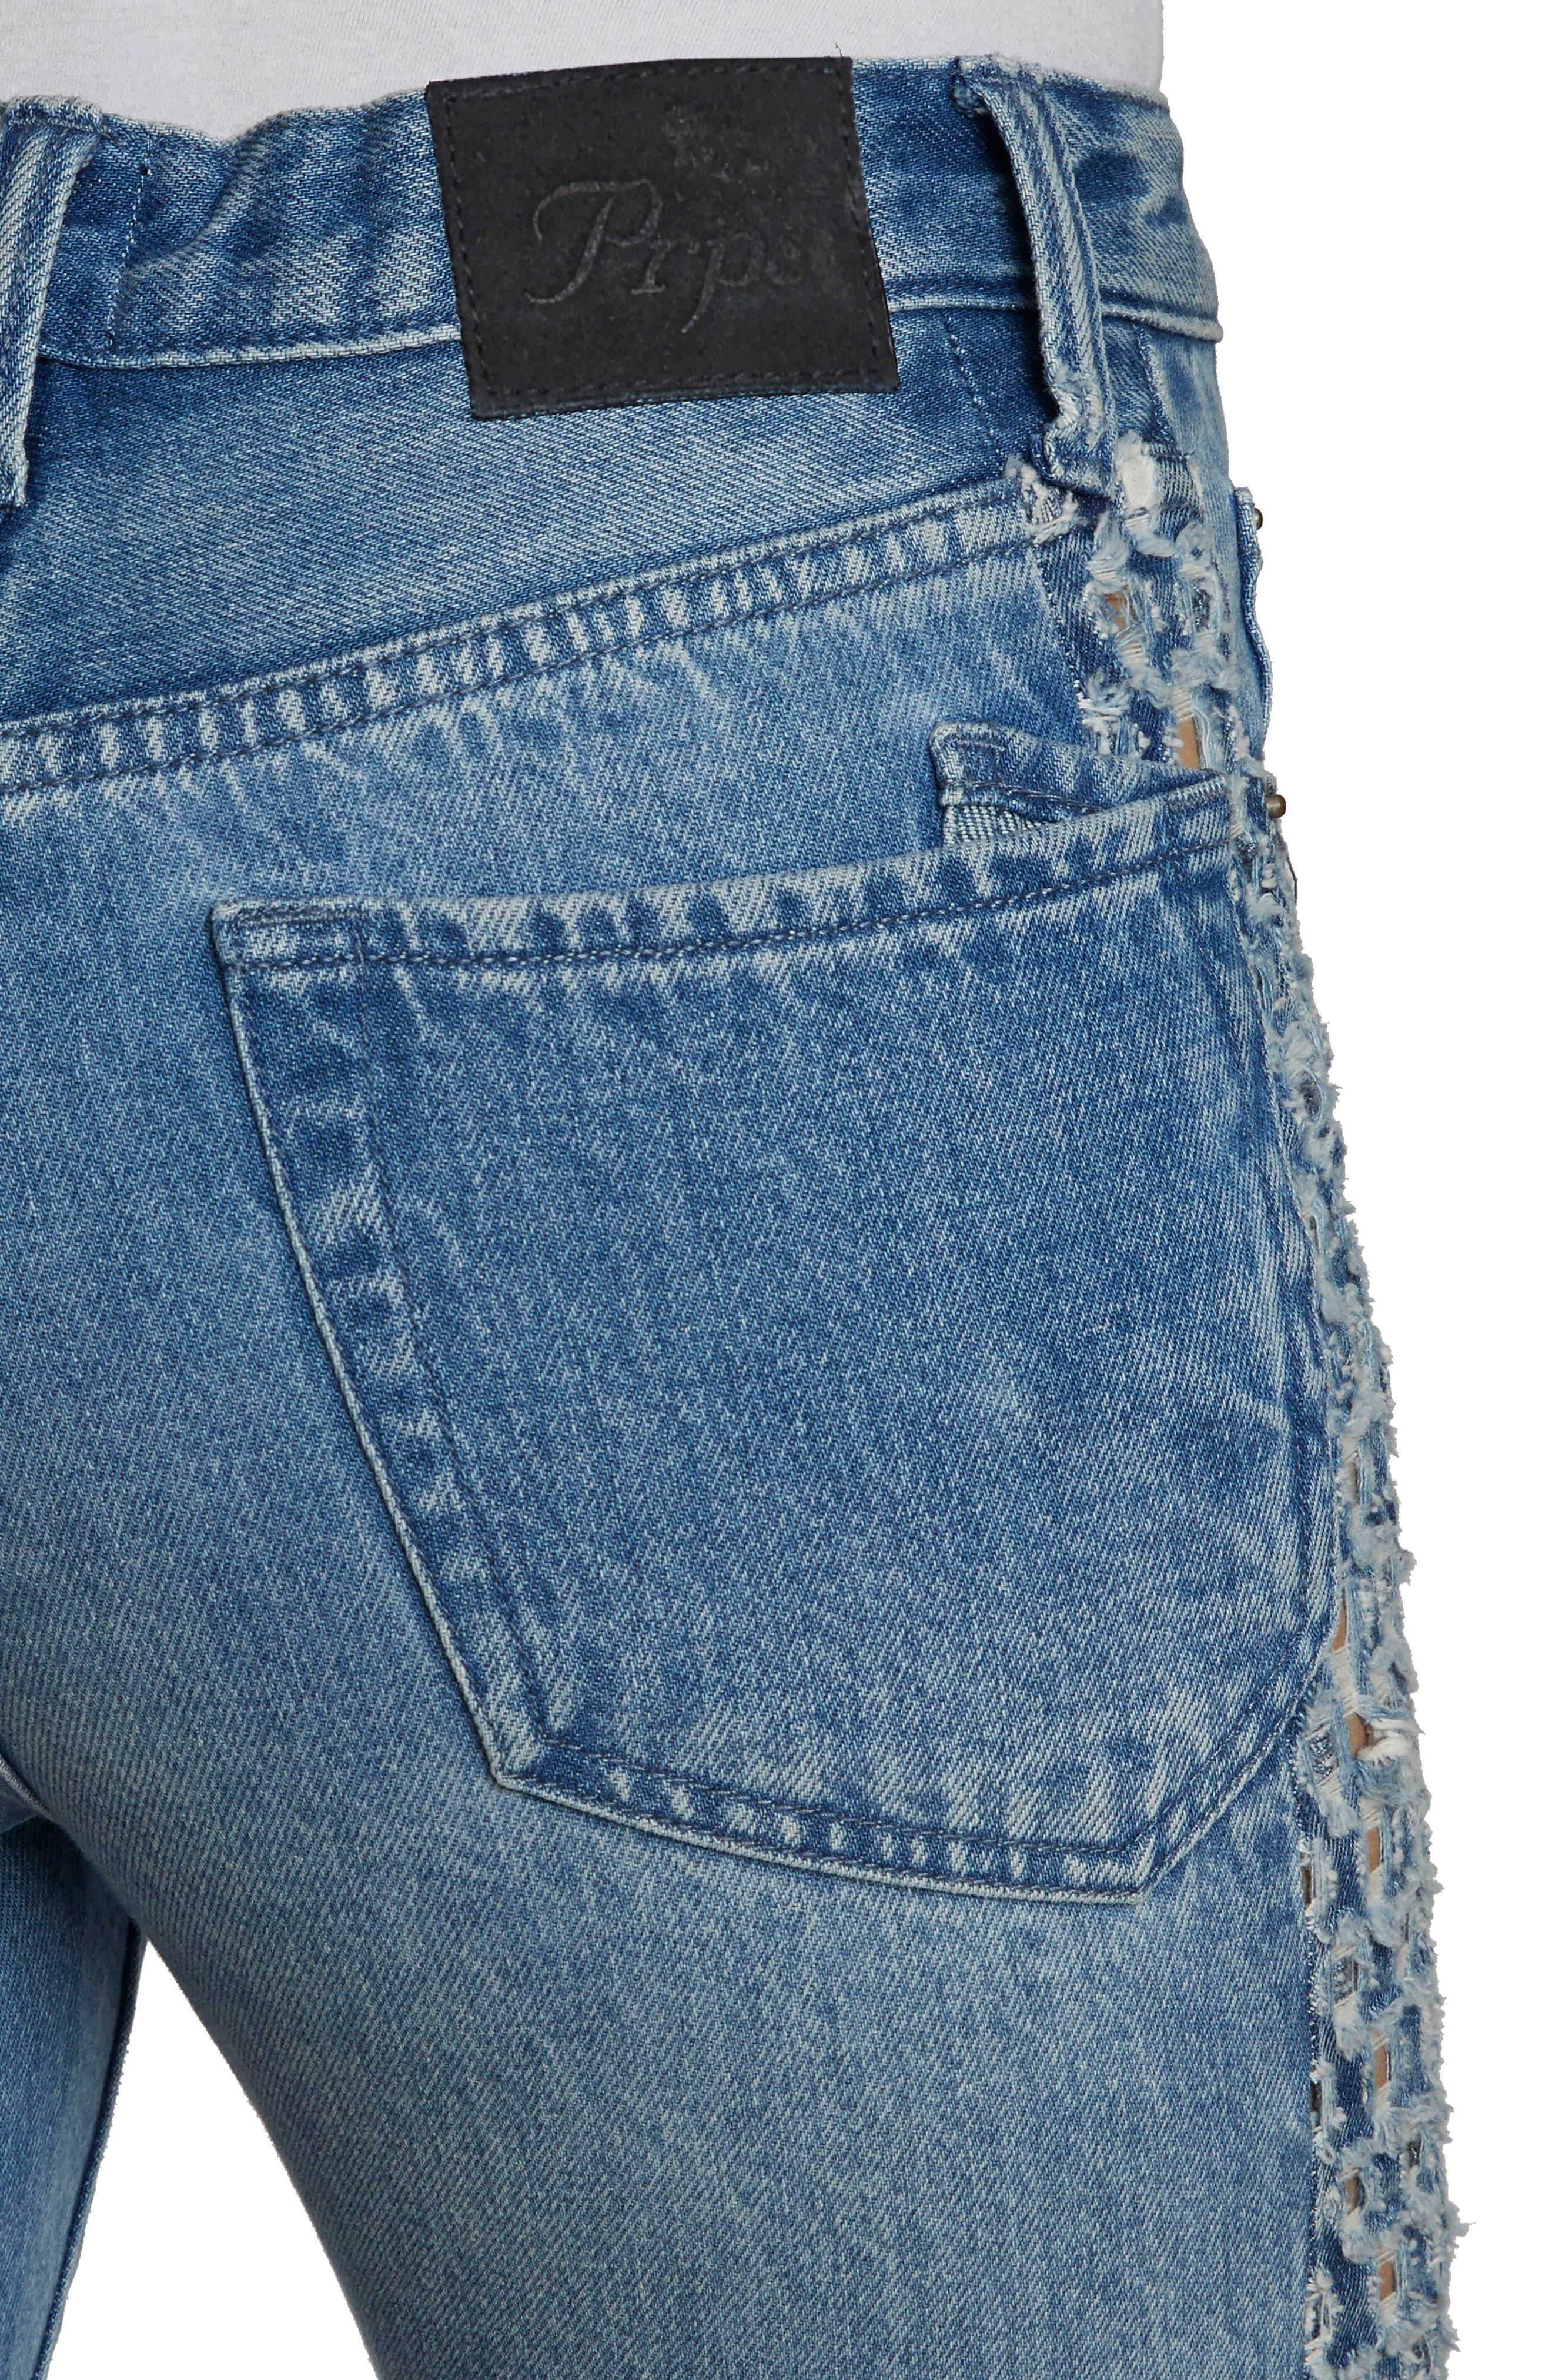 AMX Cutout Side Fray Hem Ankle Jeans,                             Alternate thumbnail 4, color,                             Light Stone